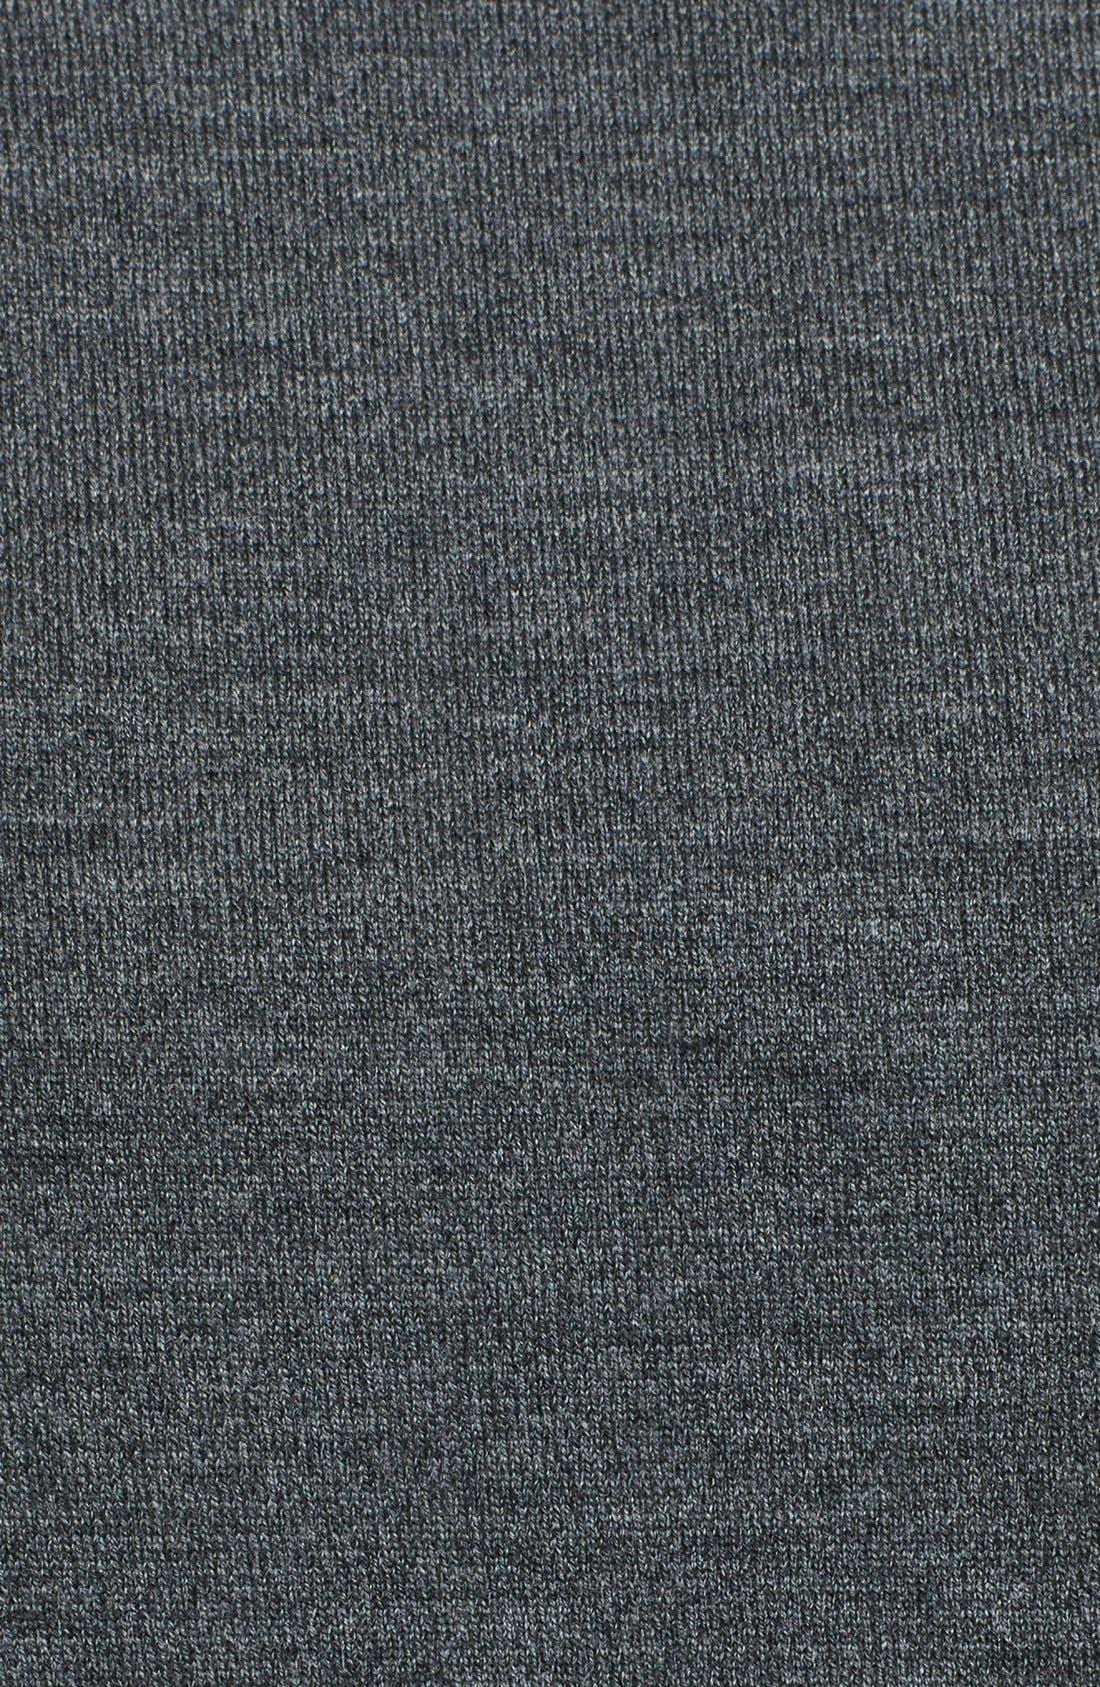 Alternate Image 3  - Alexander McQueen Fit & Flare Knit Dress